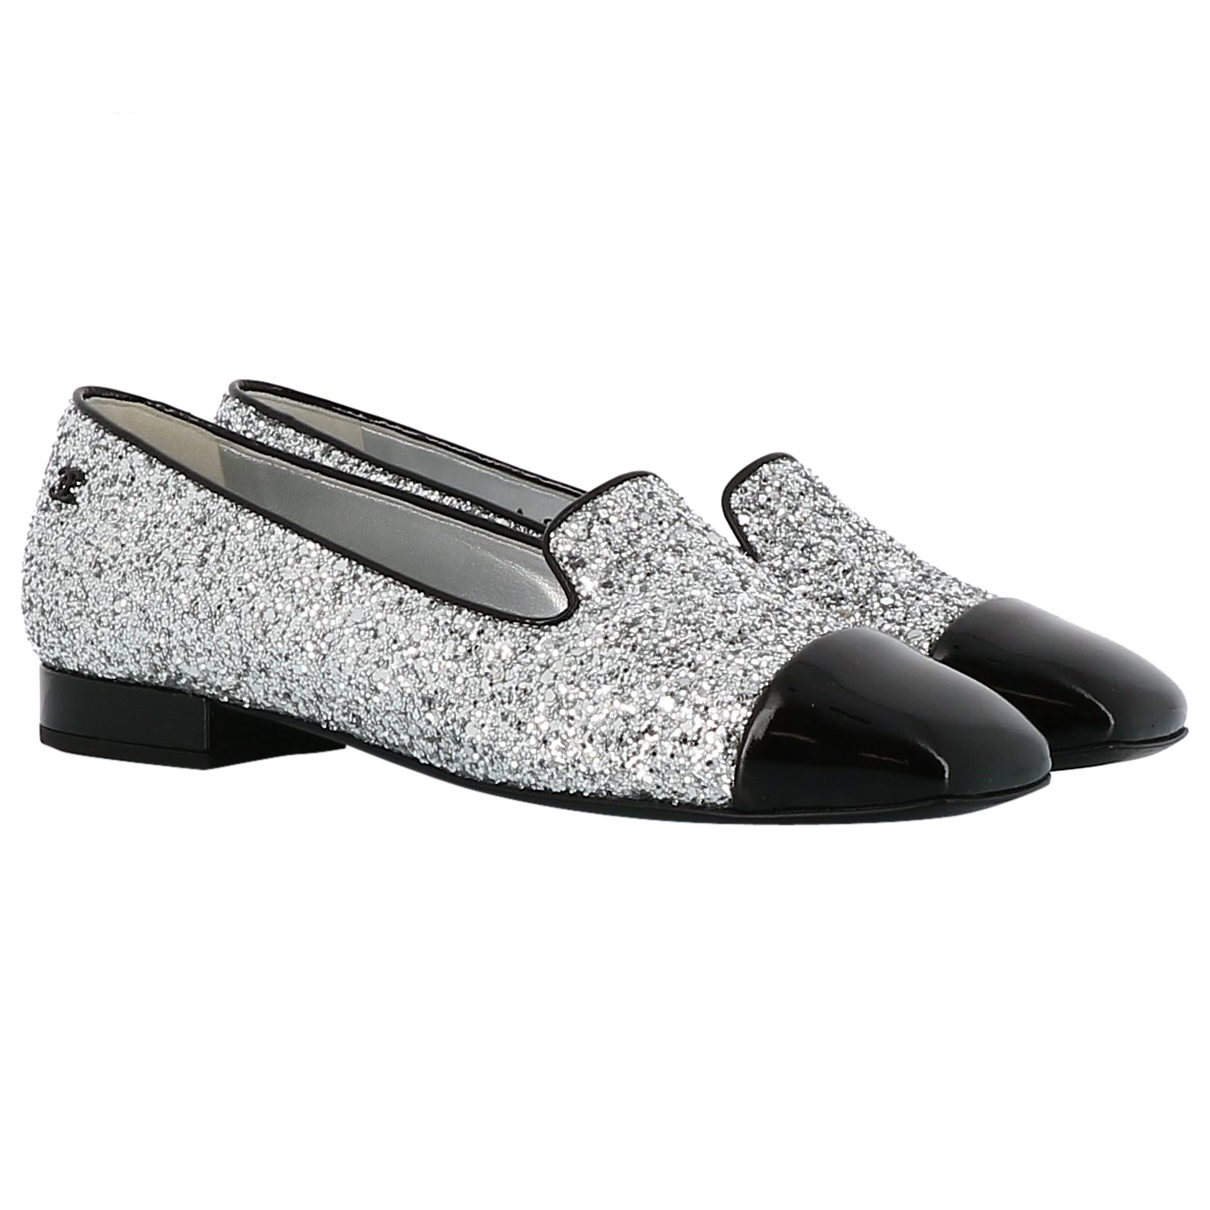 Chanel N Silver Glitter Flats for Women 36 EU